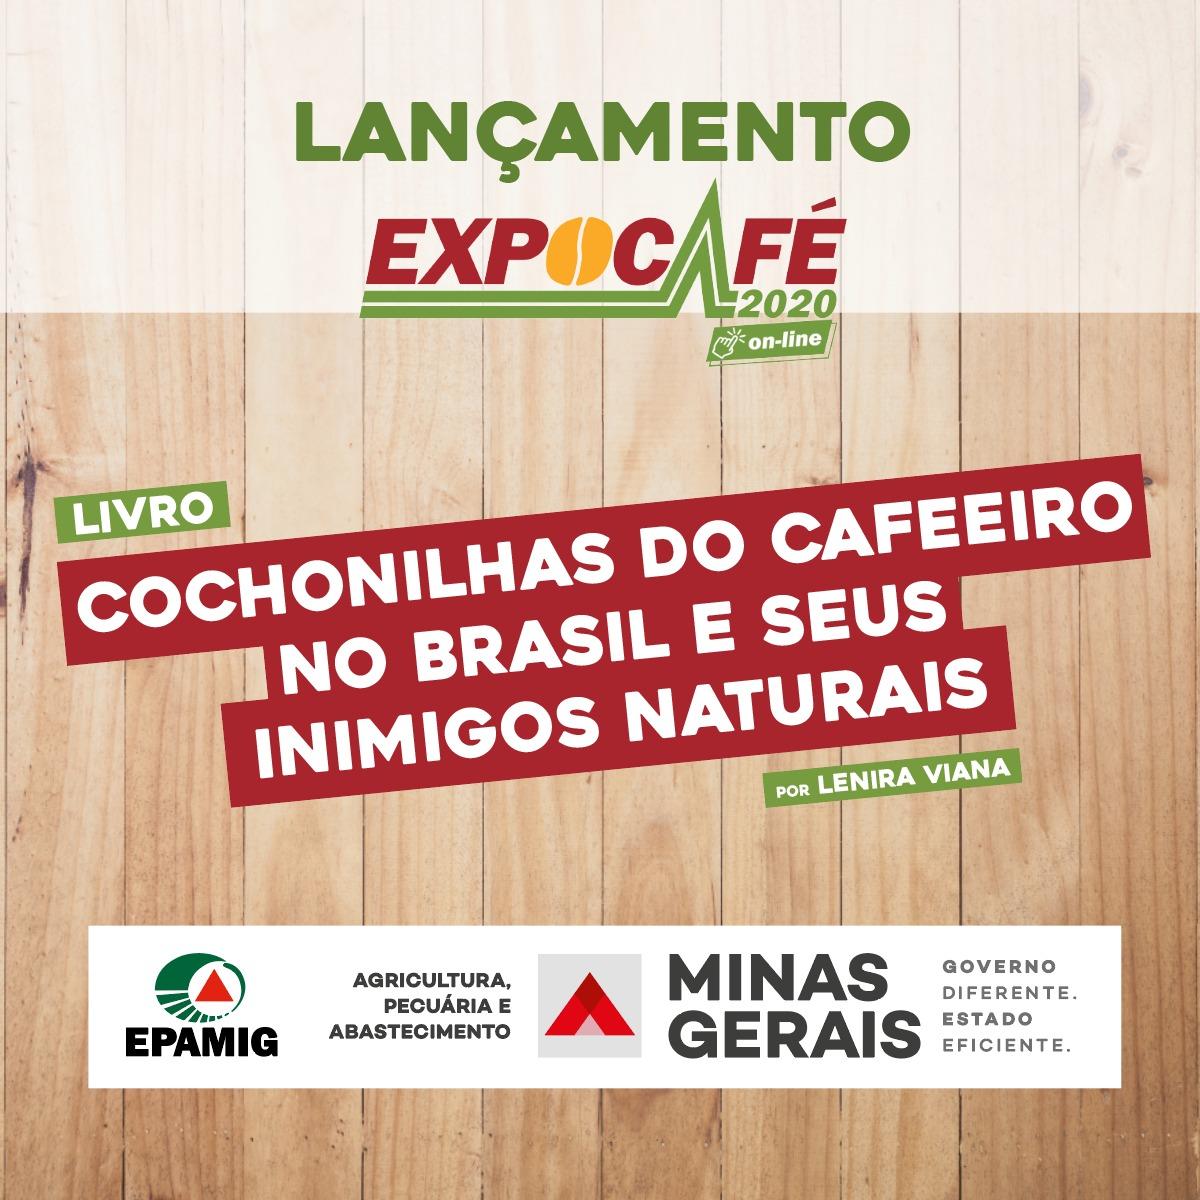 Cochonilhas do cafeeiro no Brasil e inimigos naturais